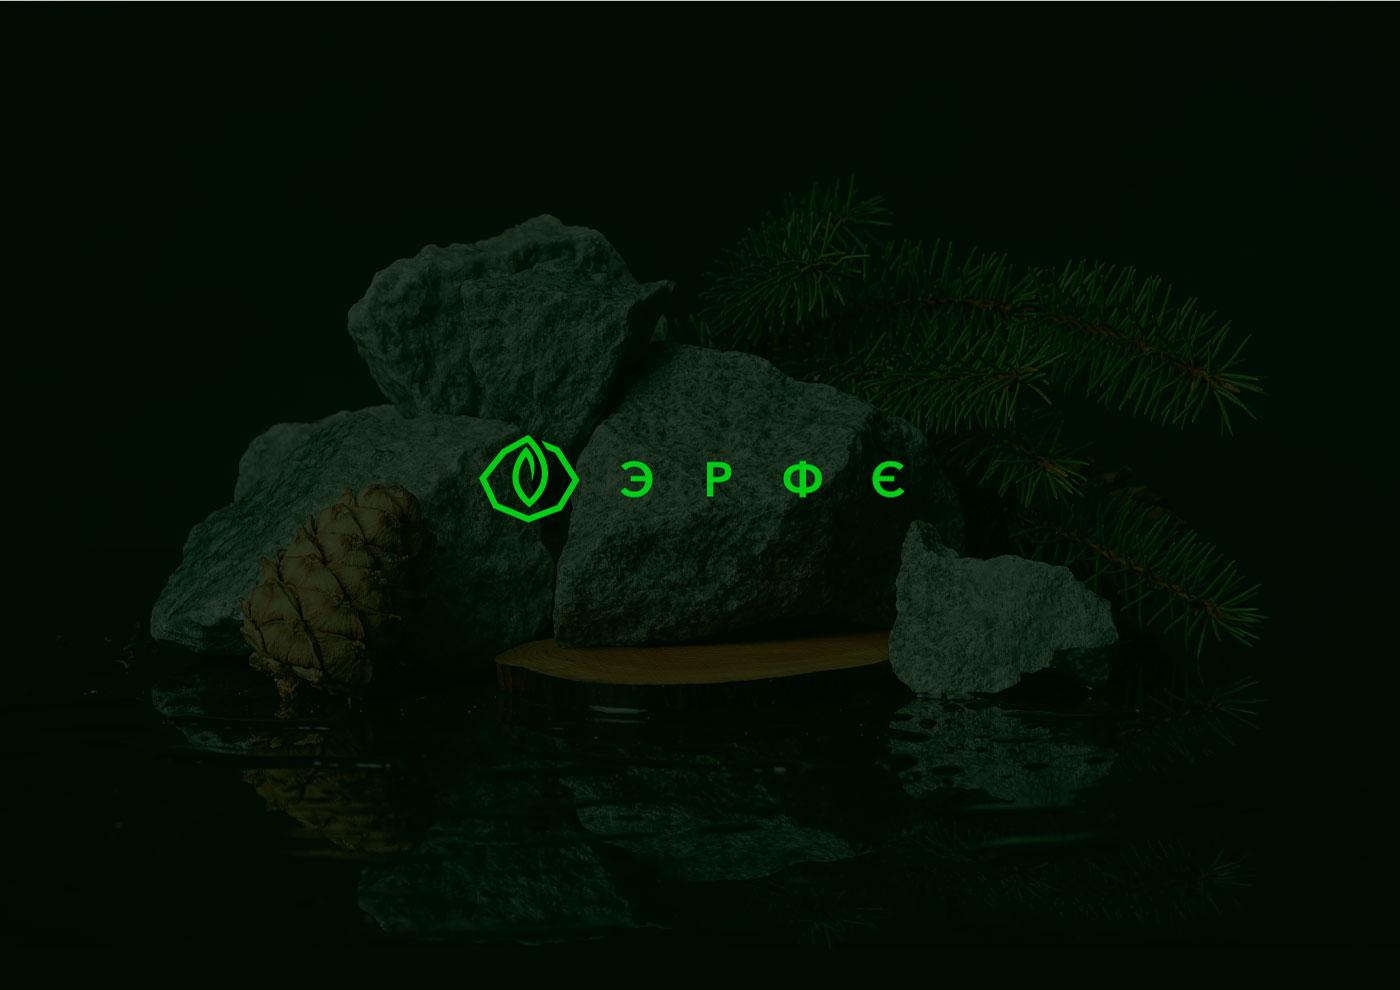 Дизайн логотипа для Сибирского жадеита Эрфэ